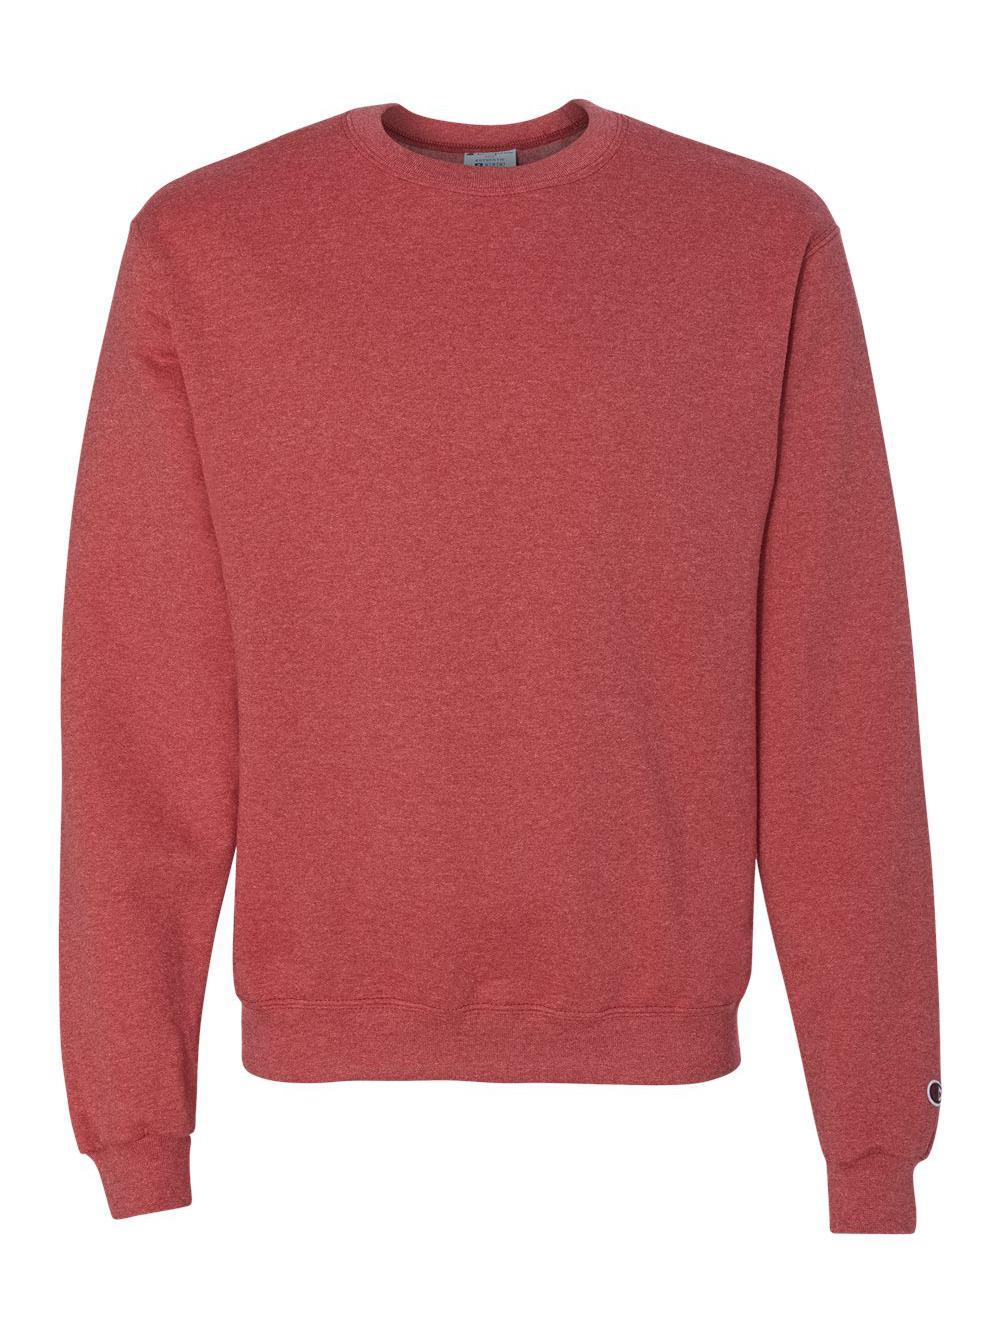 Champion-Double-Dry-Eco-Crewneck-Sweatshirt-S600 thumbnail 30